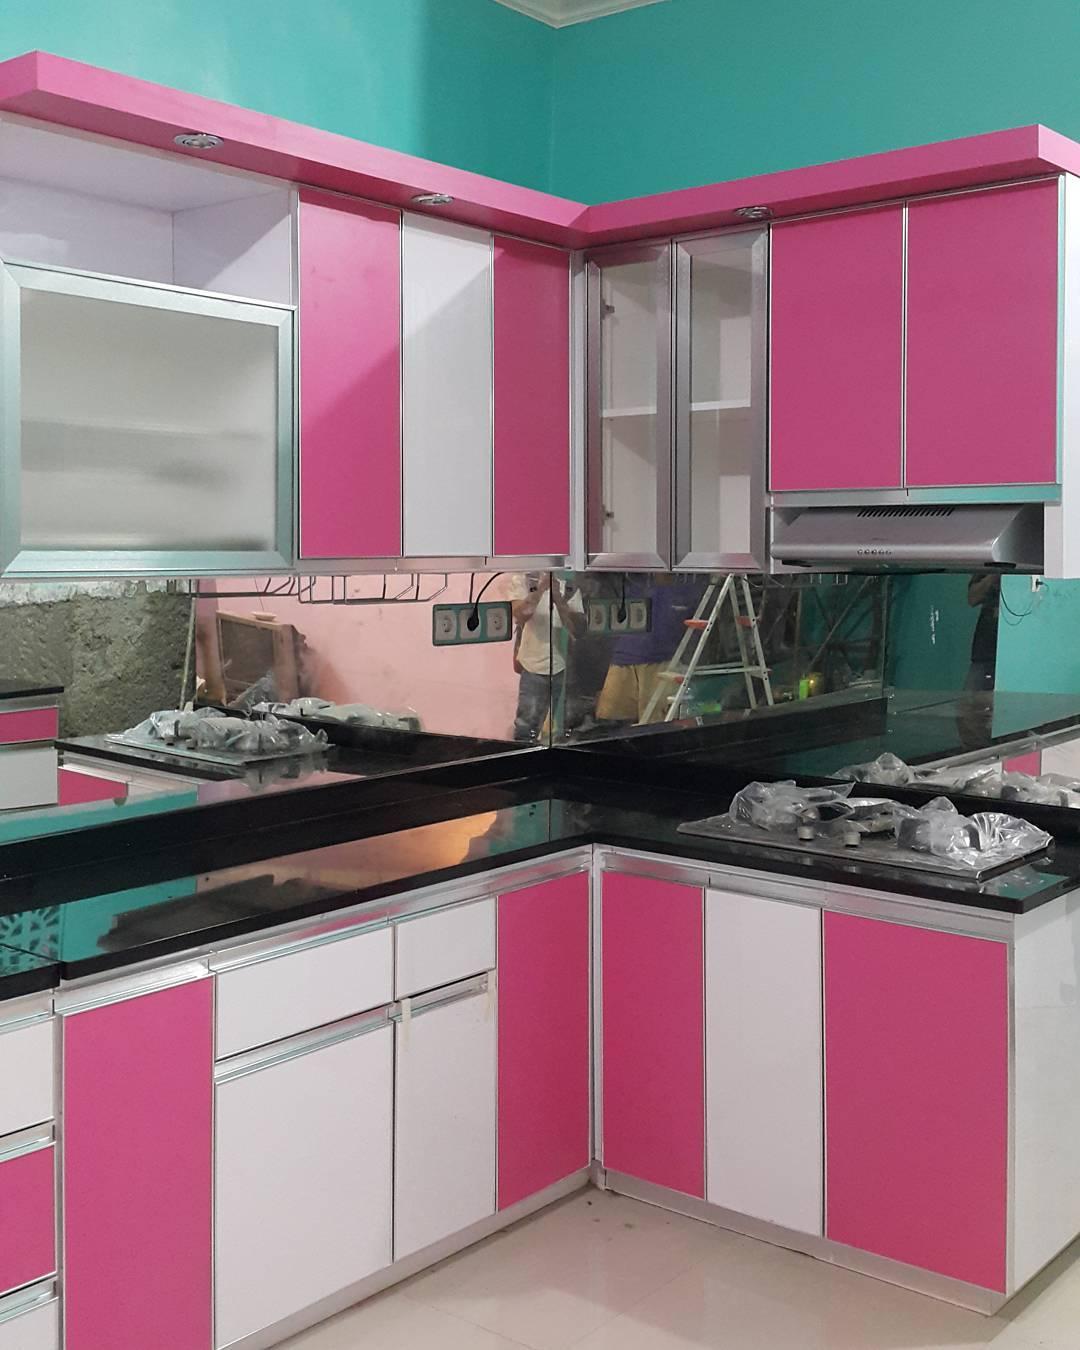 Kelly kitchen set minimalis for Buat kitchen set sendiri